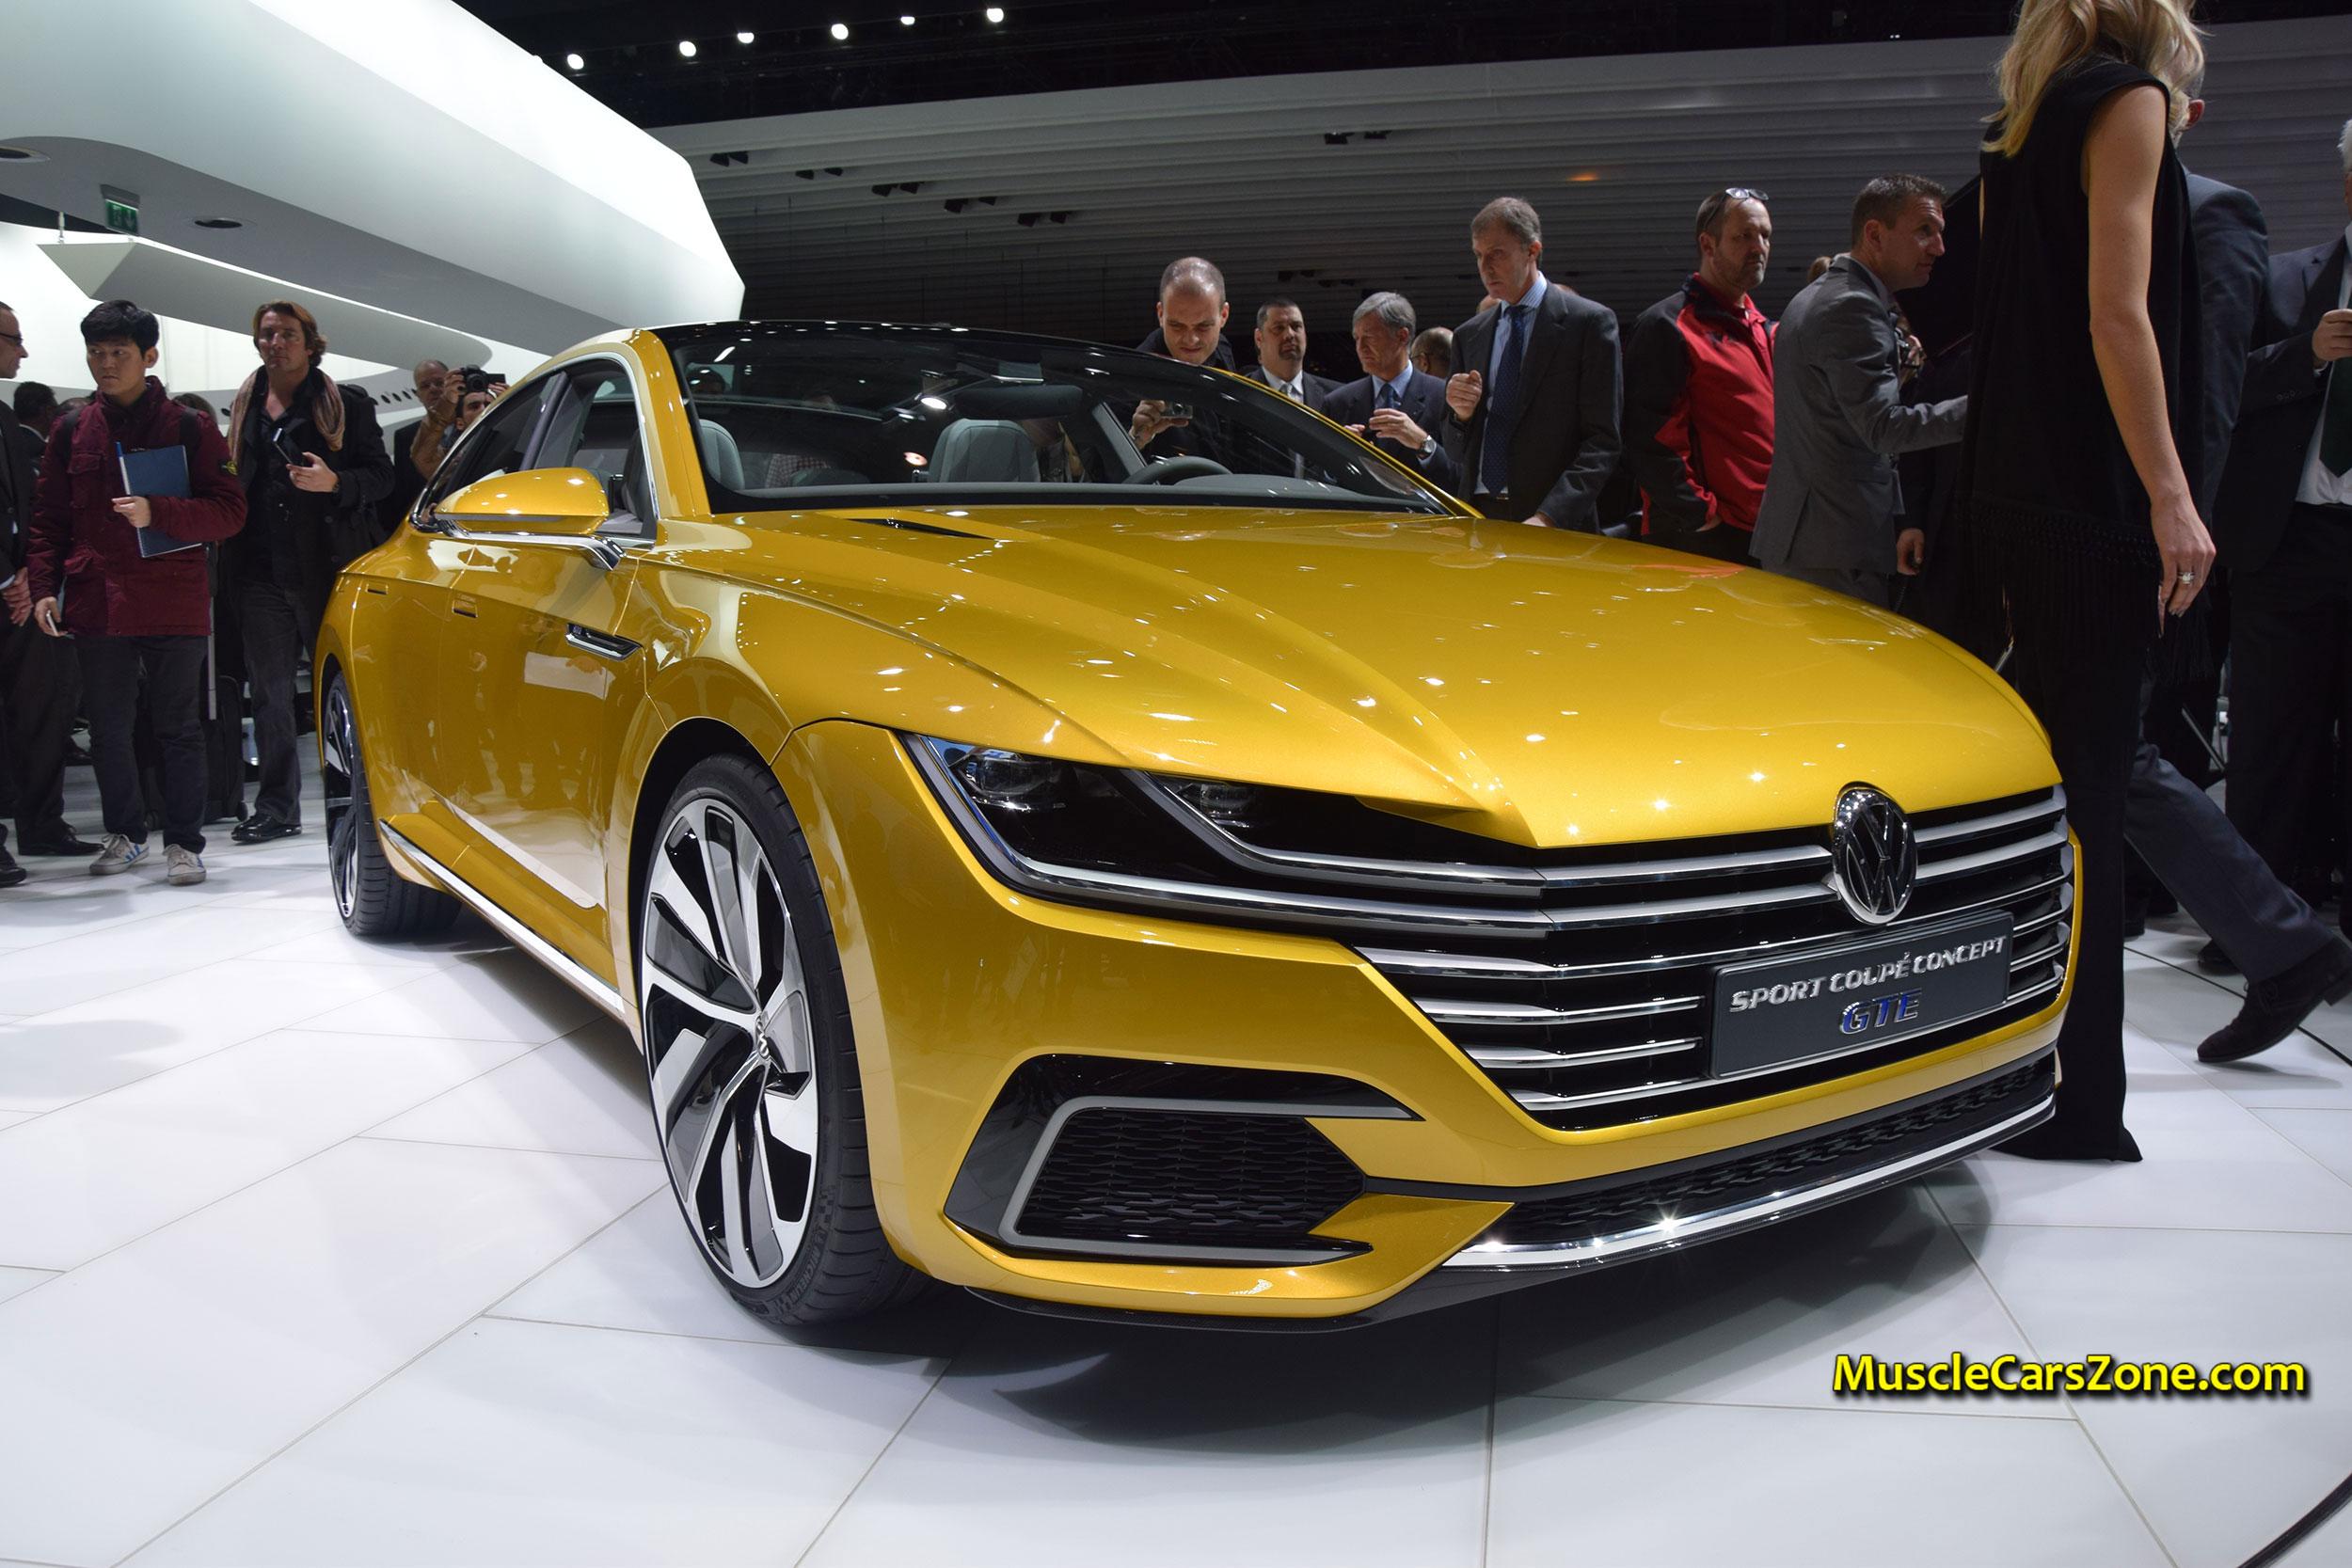 2016-VW-Sport-Coupe-GTE-Concept-03---2015-Geneva-Motor-Show.JPG